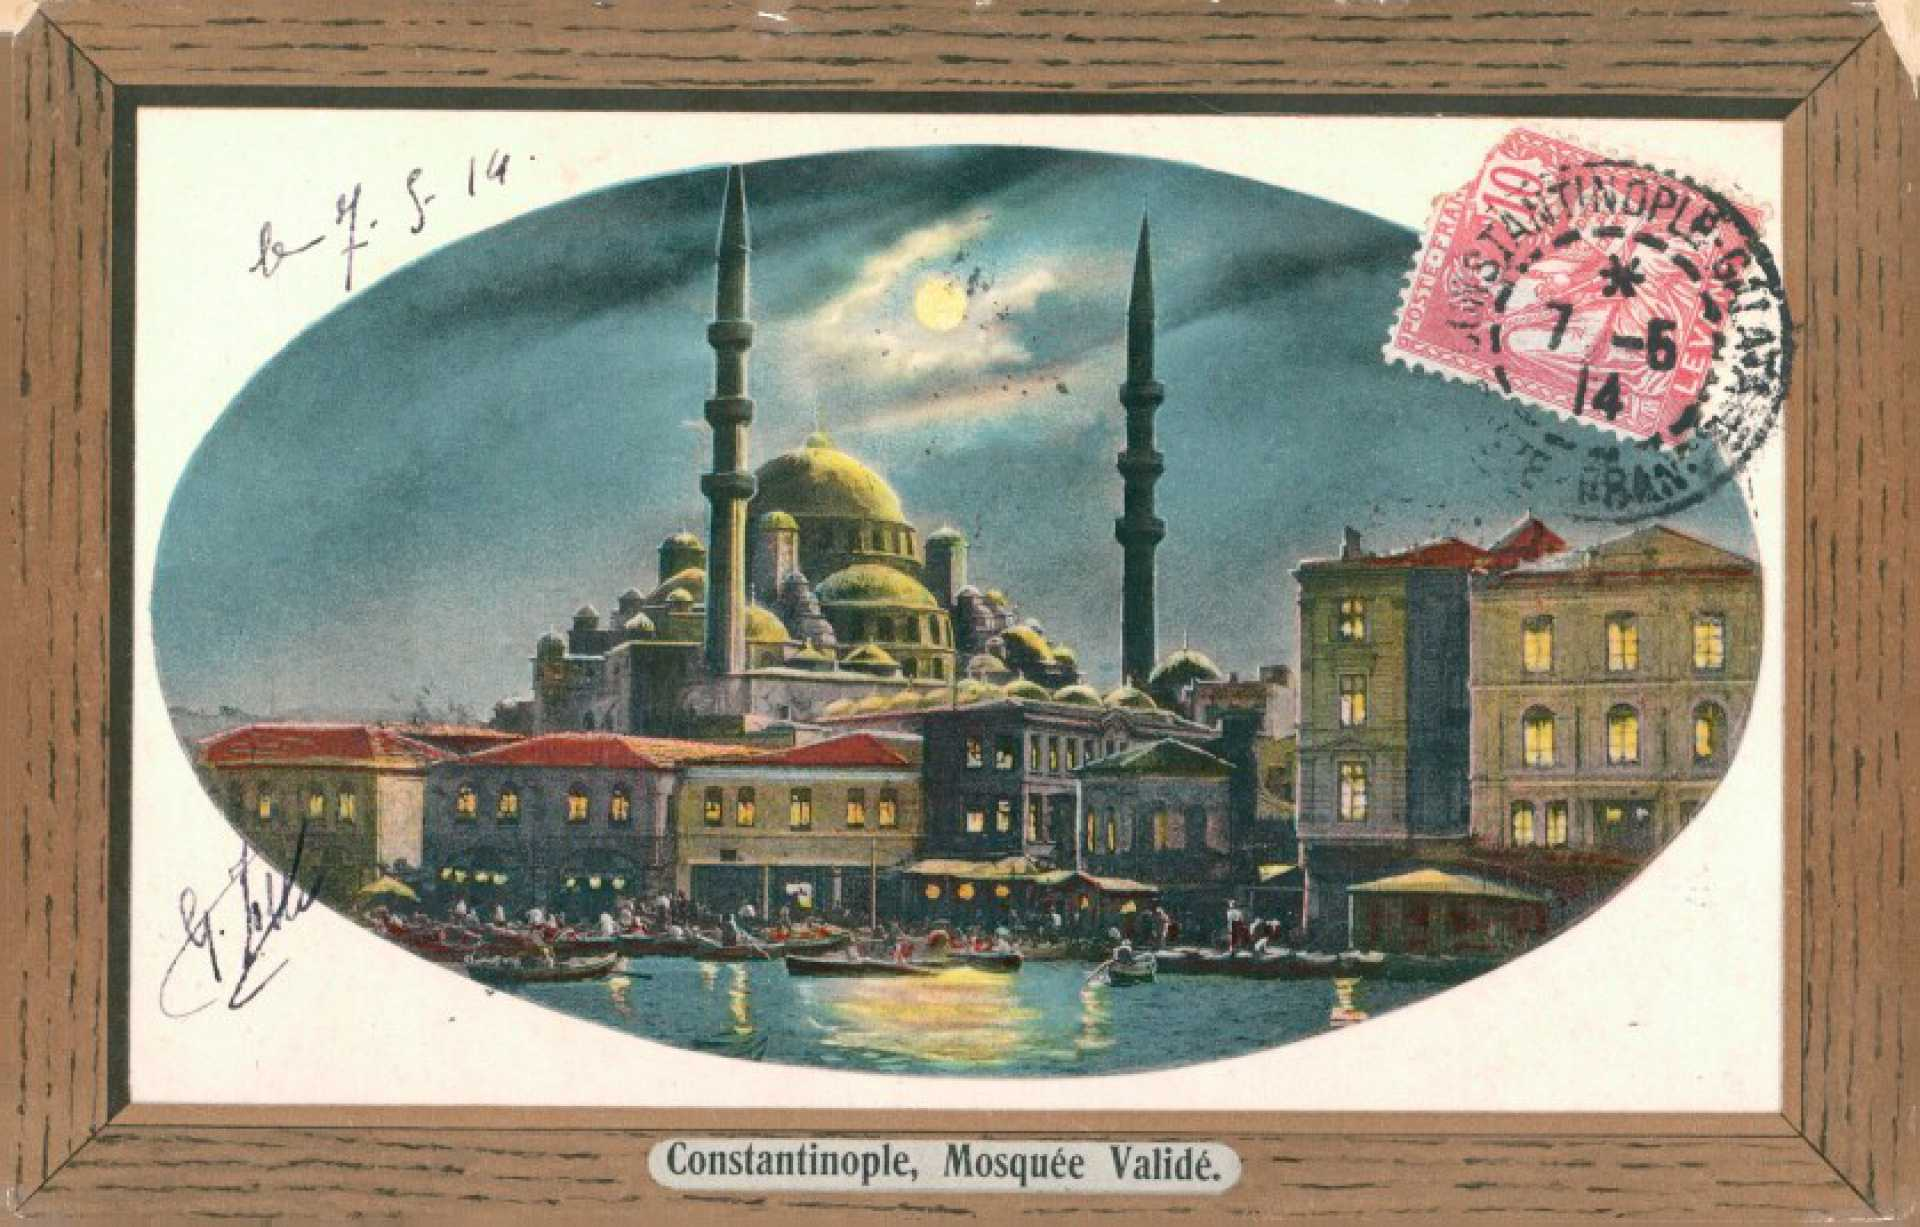 Mosquee Valide